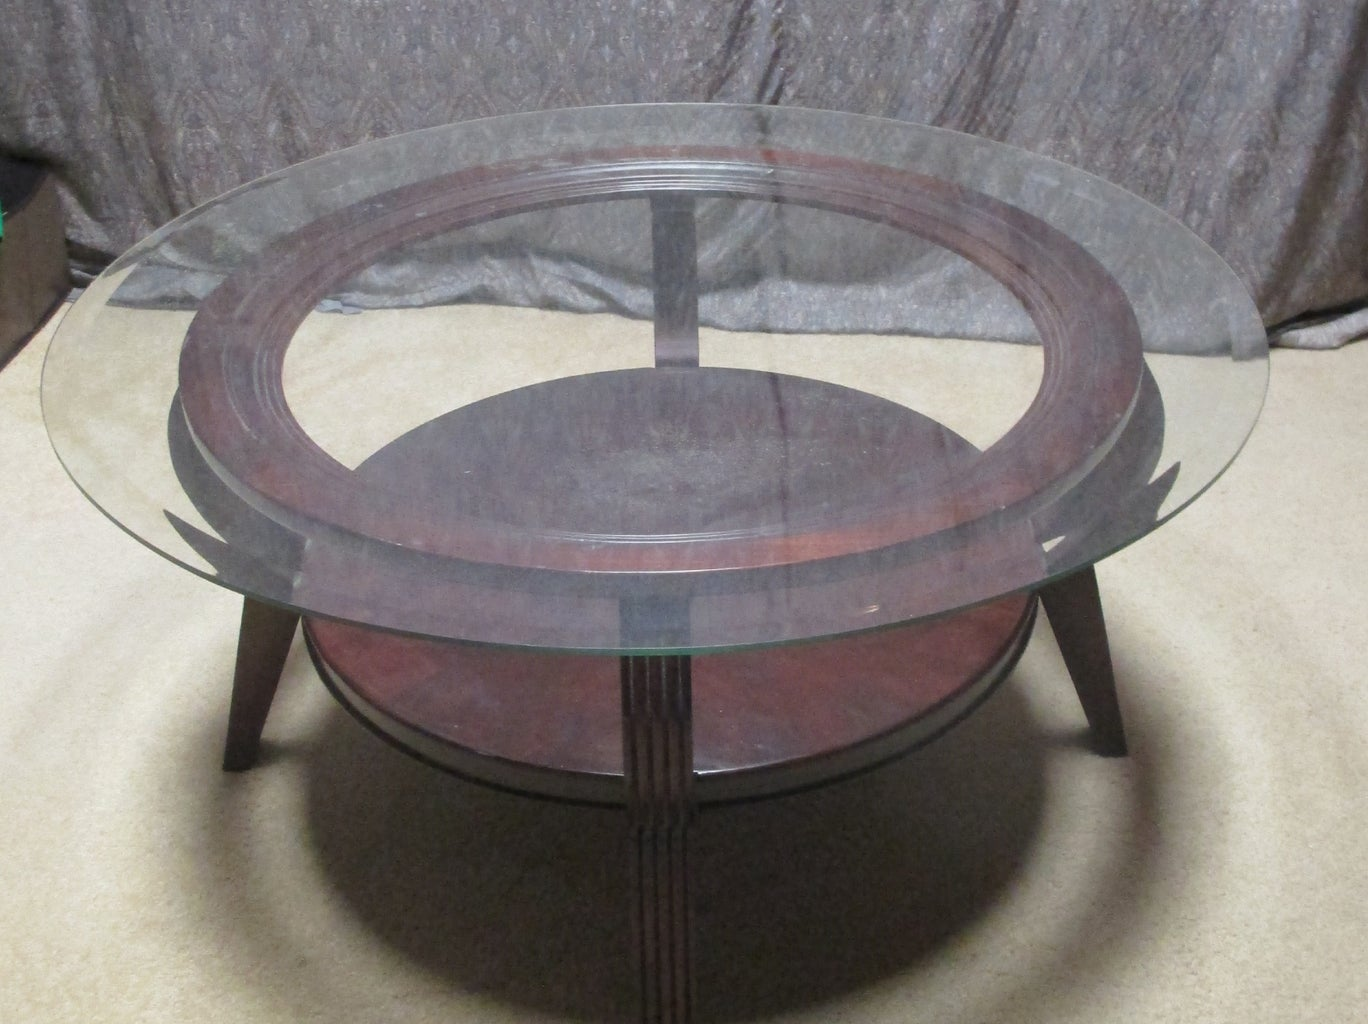 Obtain an Old Coffee Table.